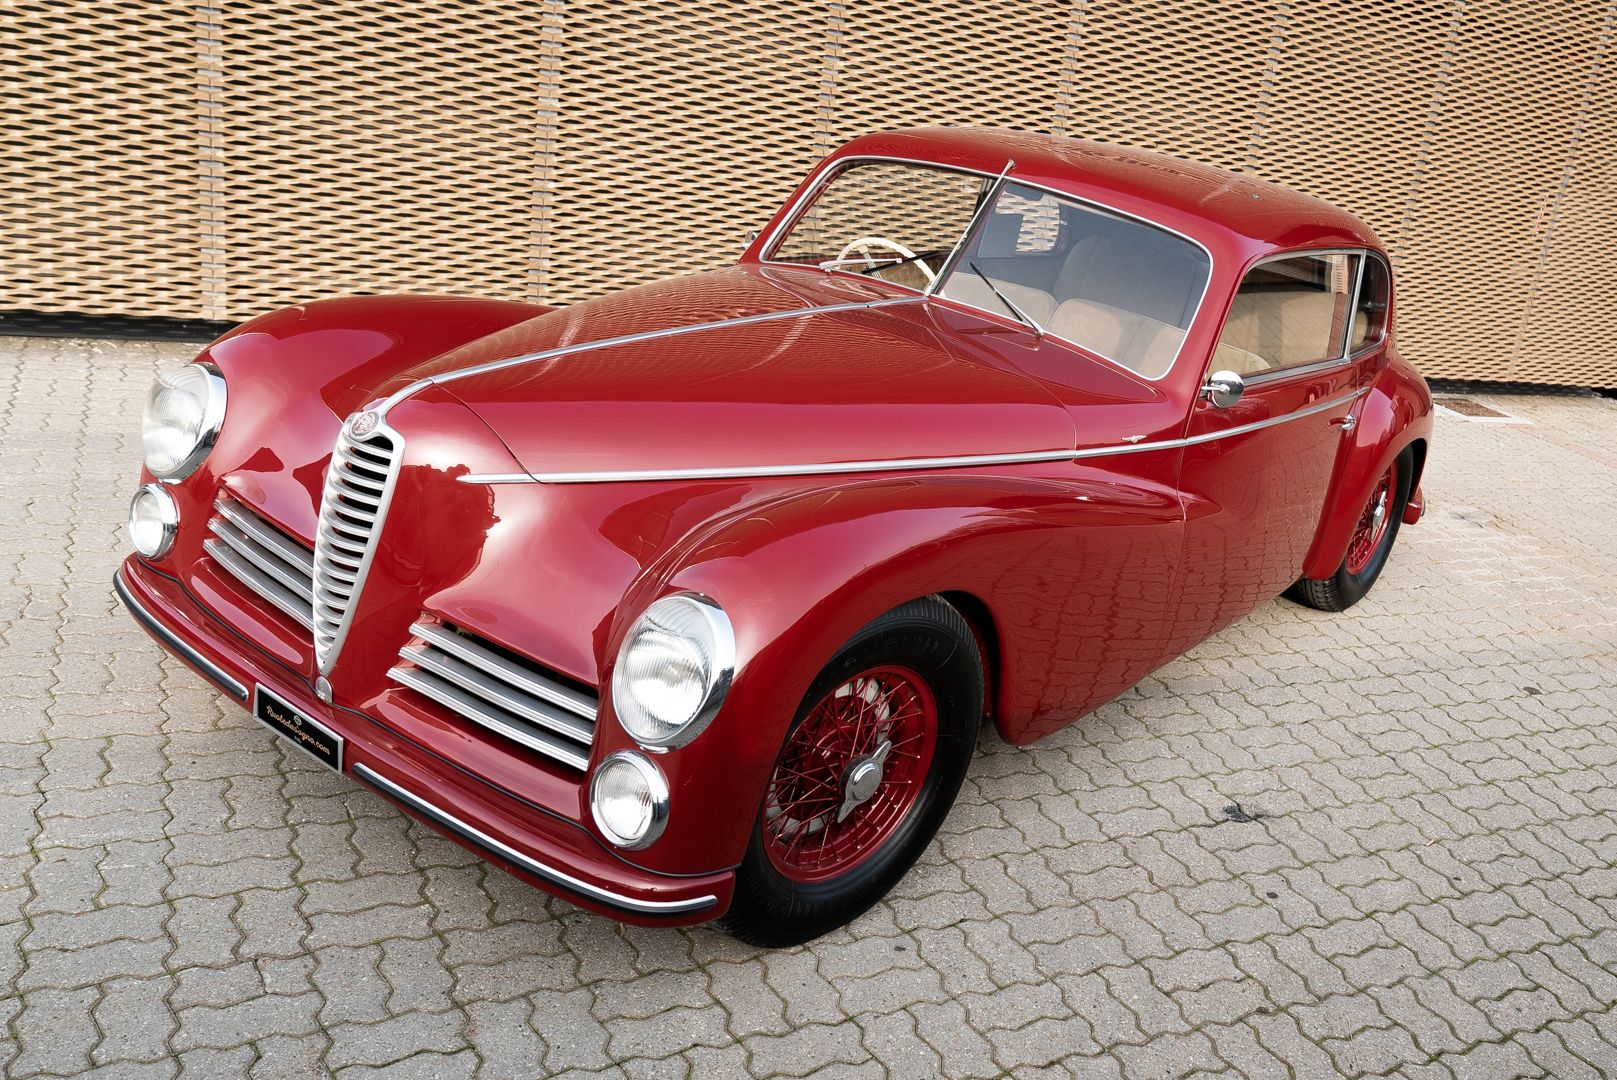 1947 Alfa Romeo Freccia d'oro 6C 2500 Sport 61714